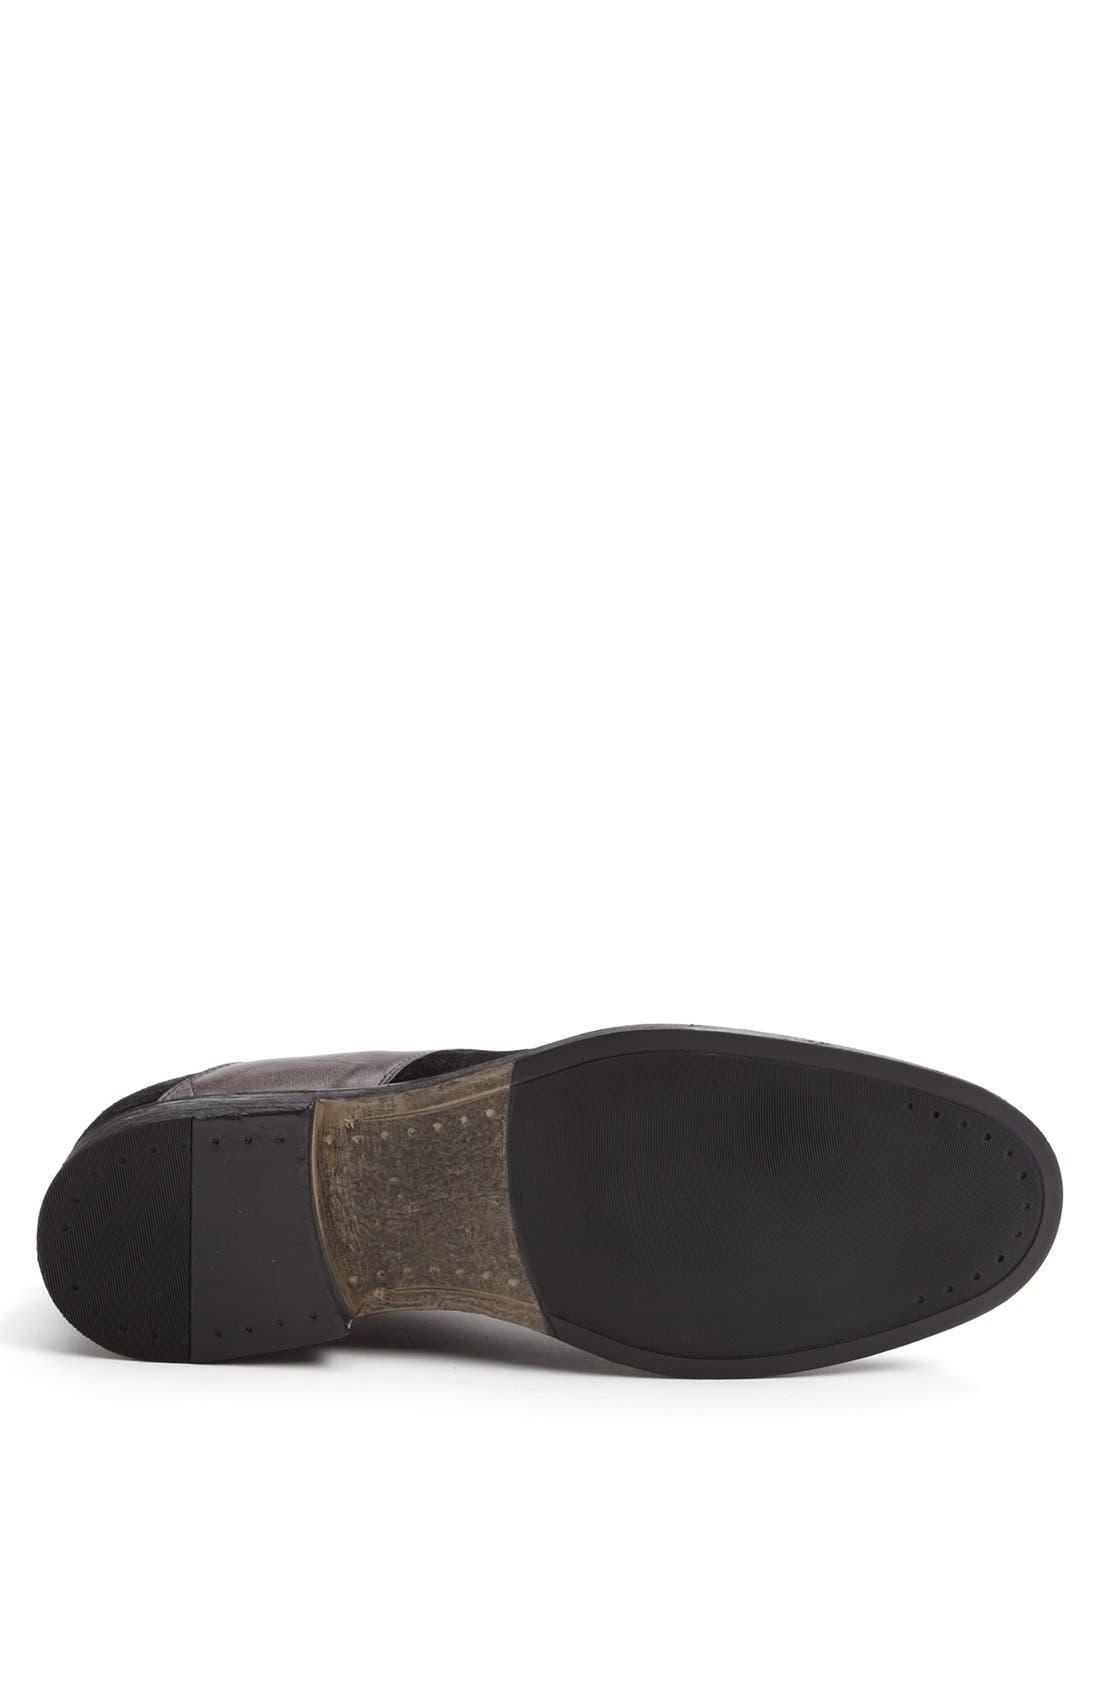 Alternate Image 4  - Wallin & Bros. 'Jacobs' Saddle Shoe